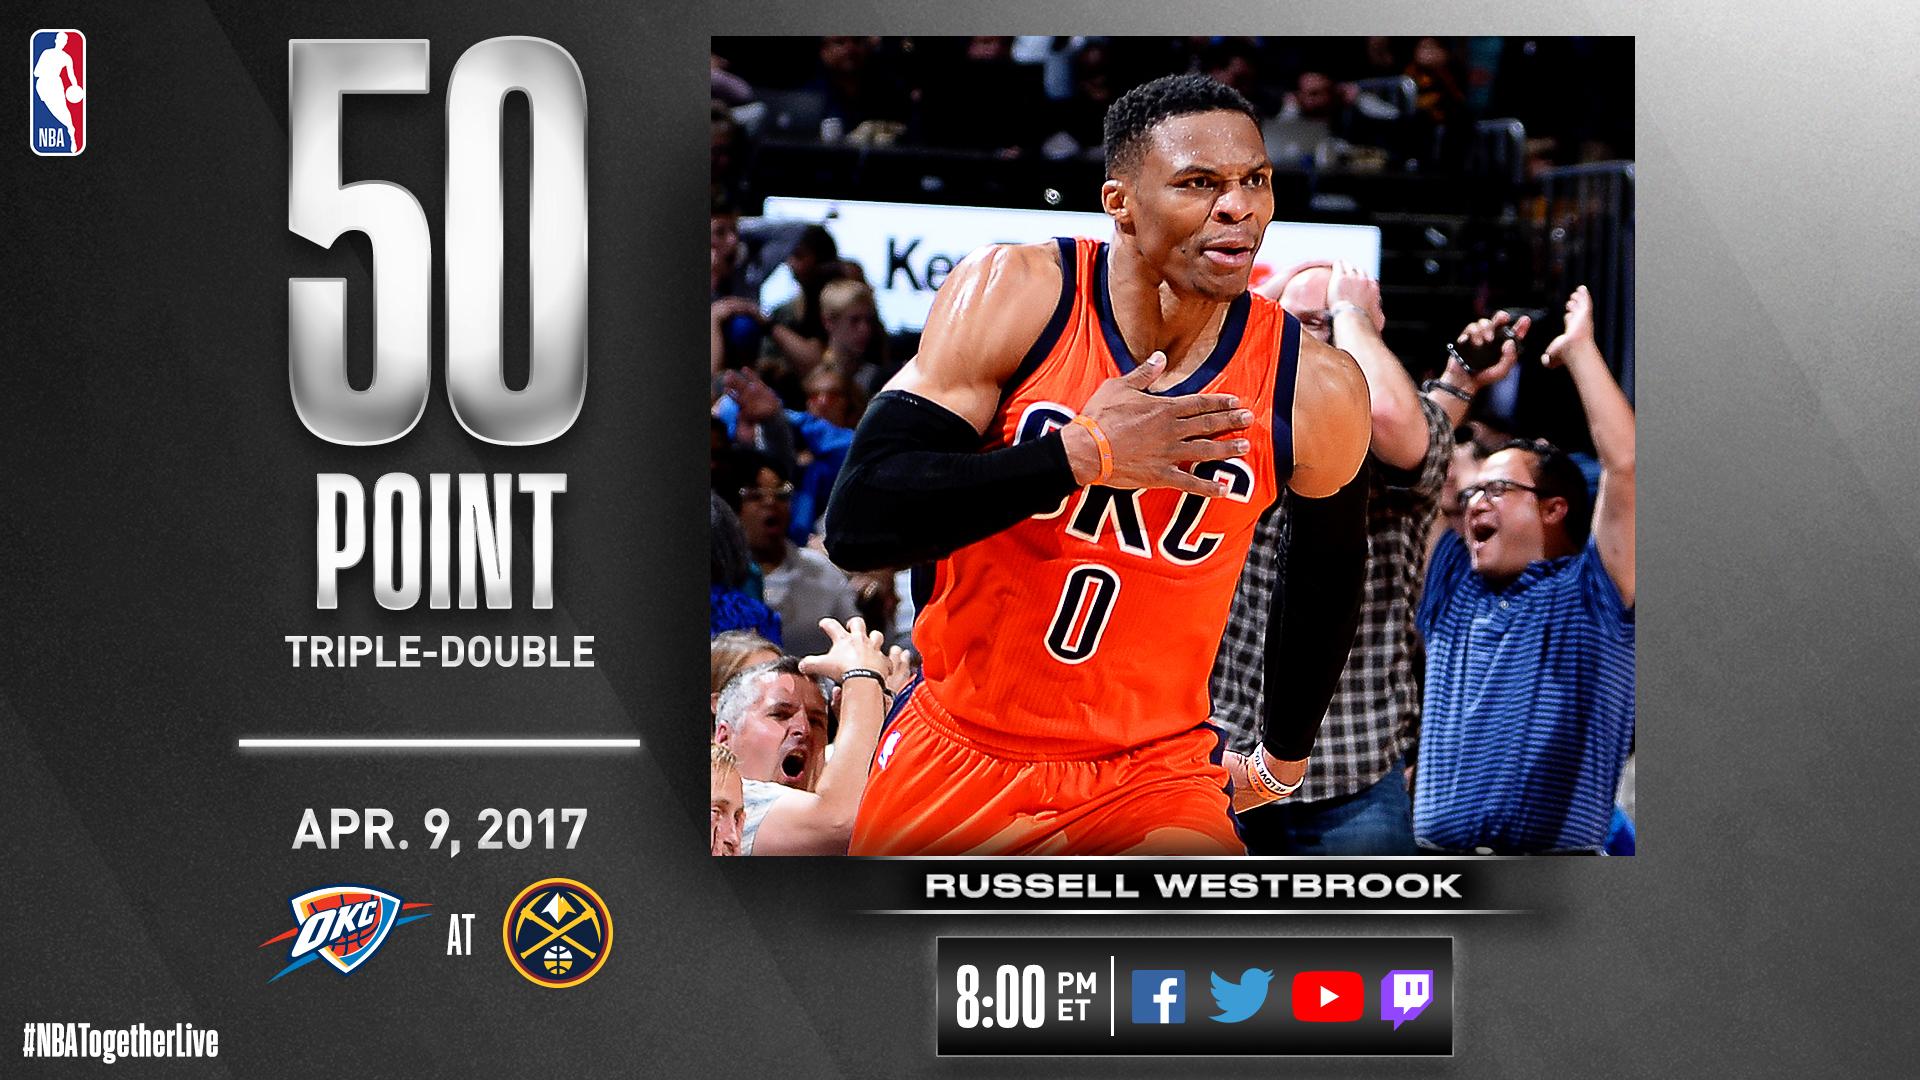 NBA官方将回放威斯布鲁克17年50分16篮板10助攻的比赛